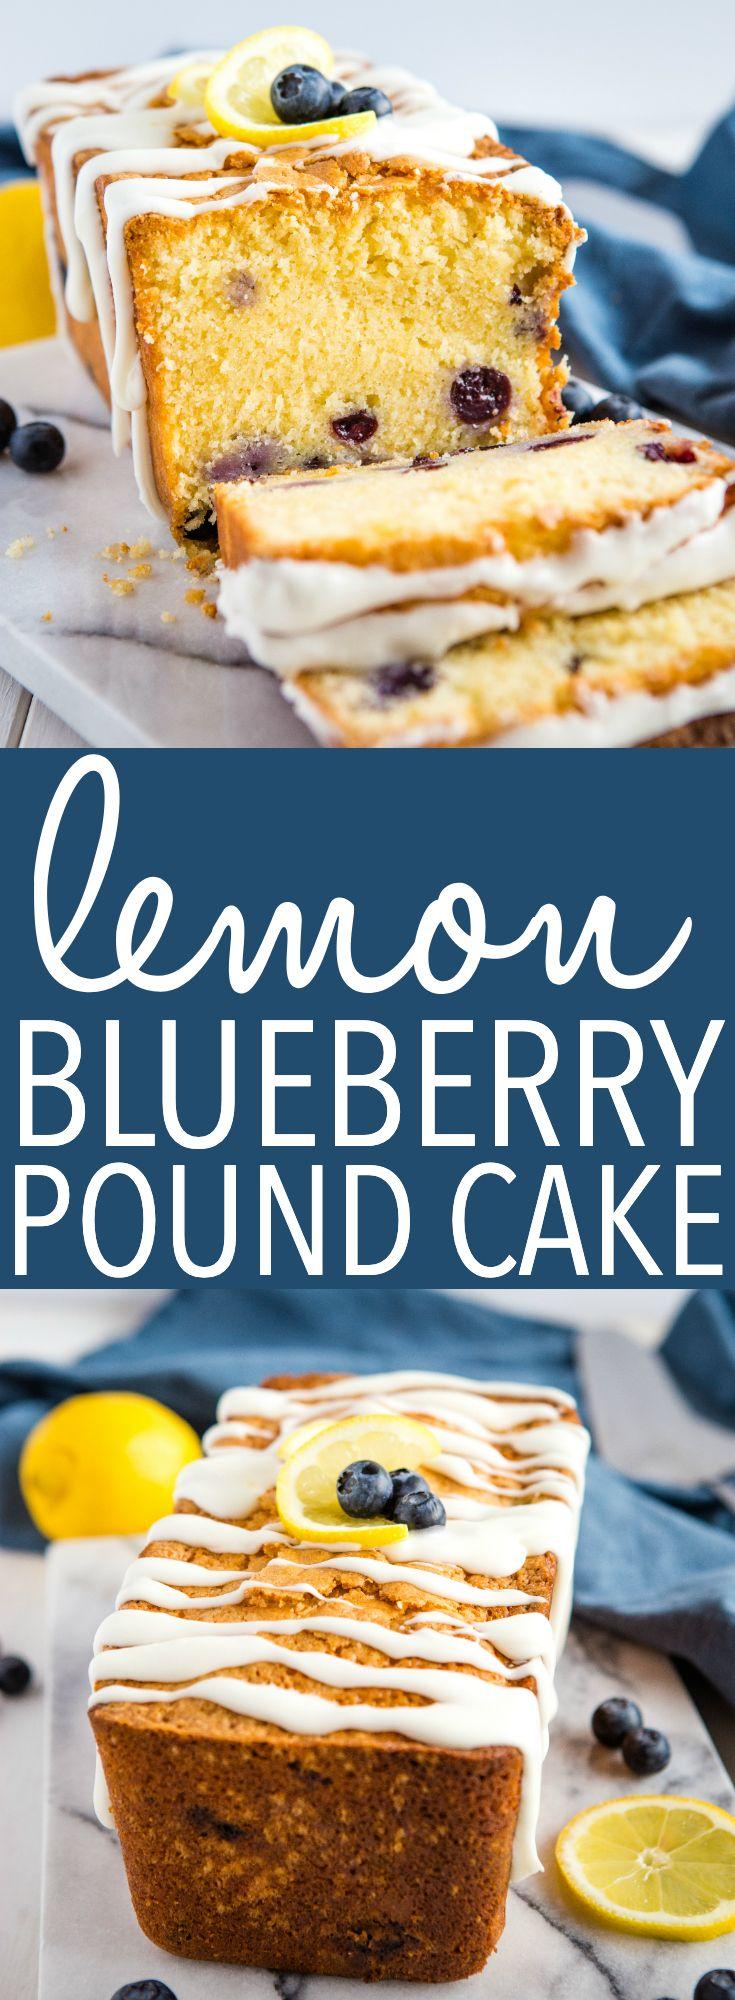 Lemon Blueberry Pound Cake | Recipe | Spring desserts ...